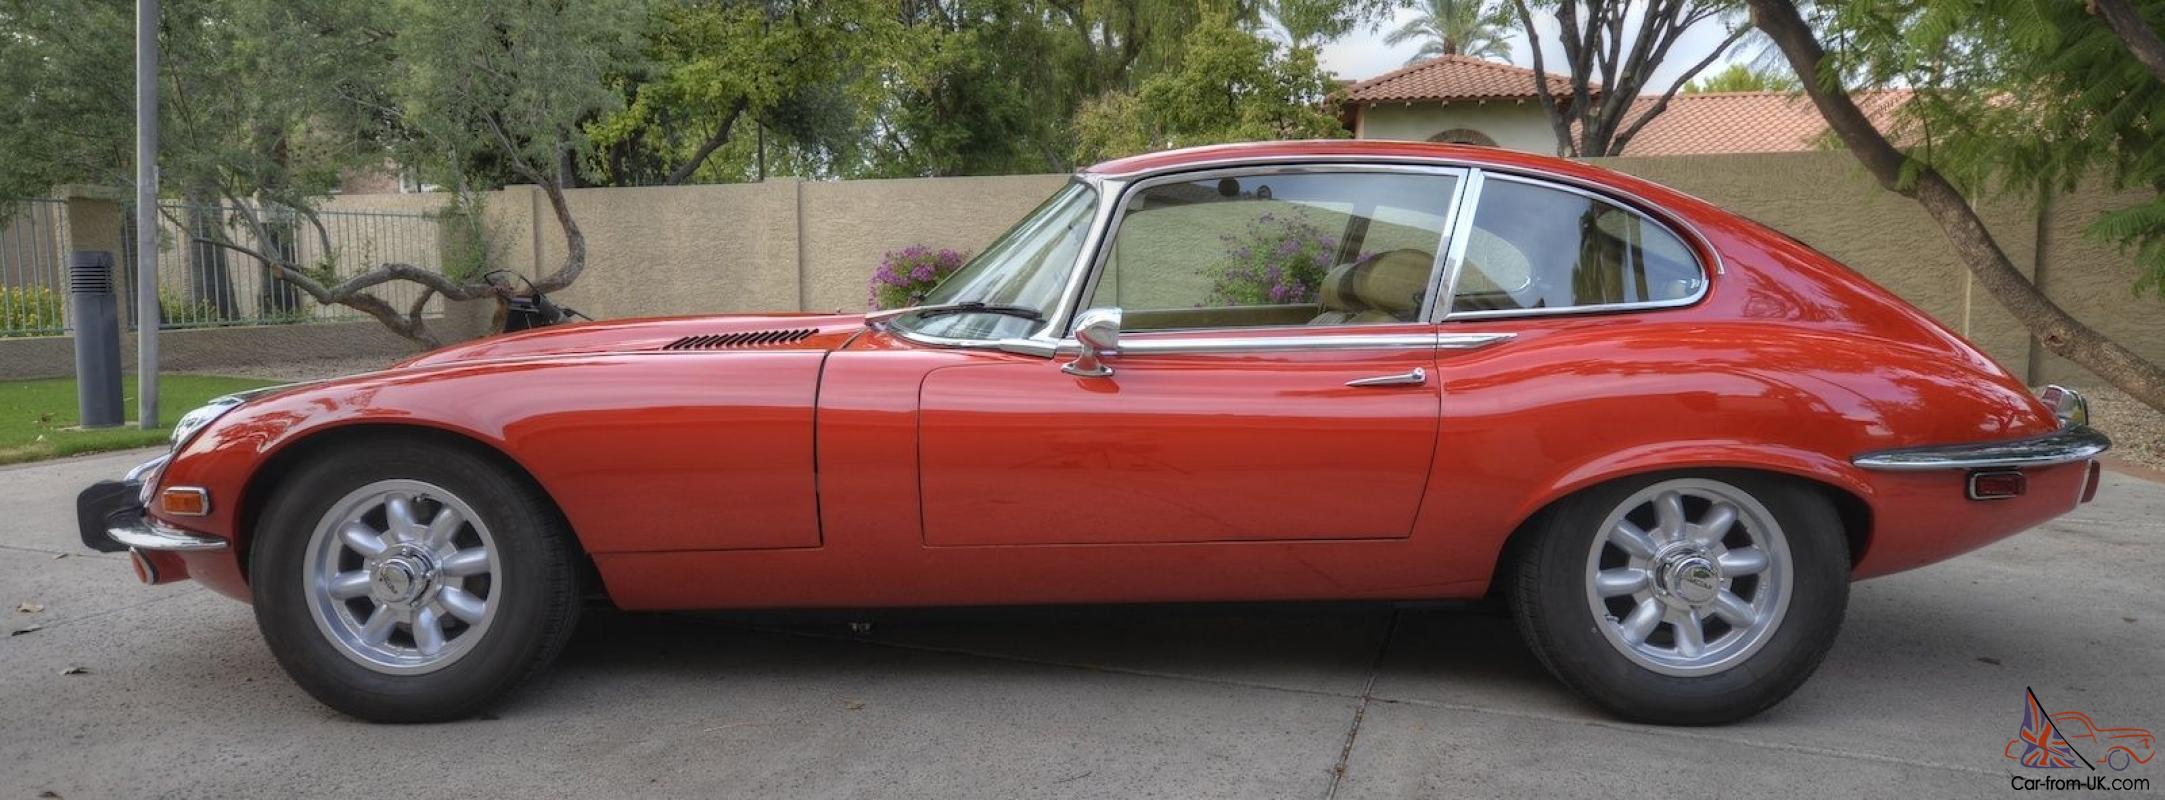 1969 JAGUAR XKE ROADSTER 71274 additionally 1961 Ferrari 250 GT California photo furthermore LeClaire 20140802 as well 1967 Jaguar E Type Roadster Green Metallic Fully Restored Gorgeous Series 1 besides 1969 JAGUAR XKE ROADSTER 202107. on 1969 jaguar xke